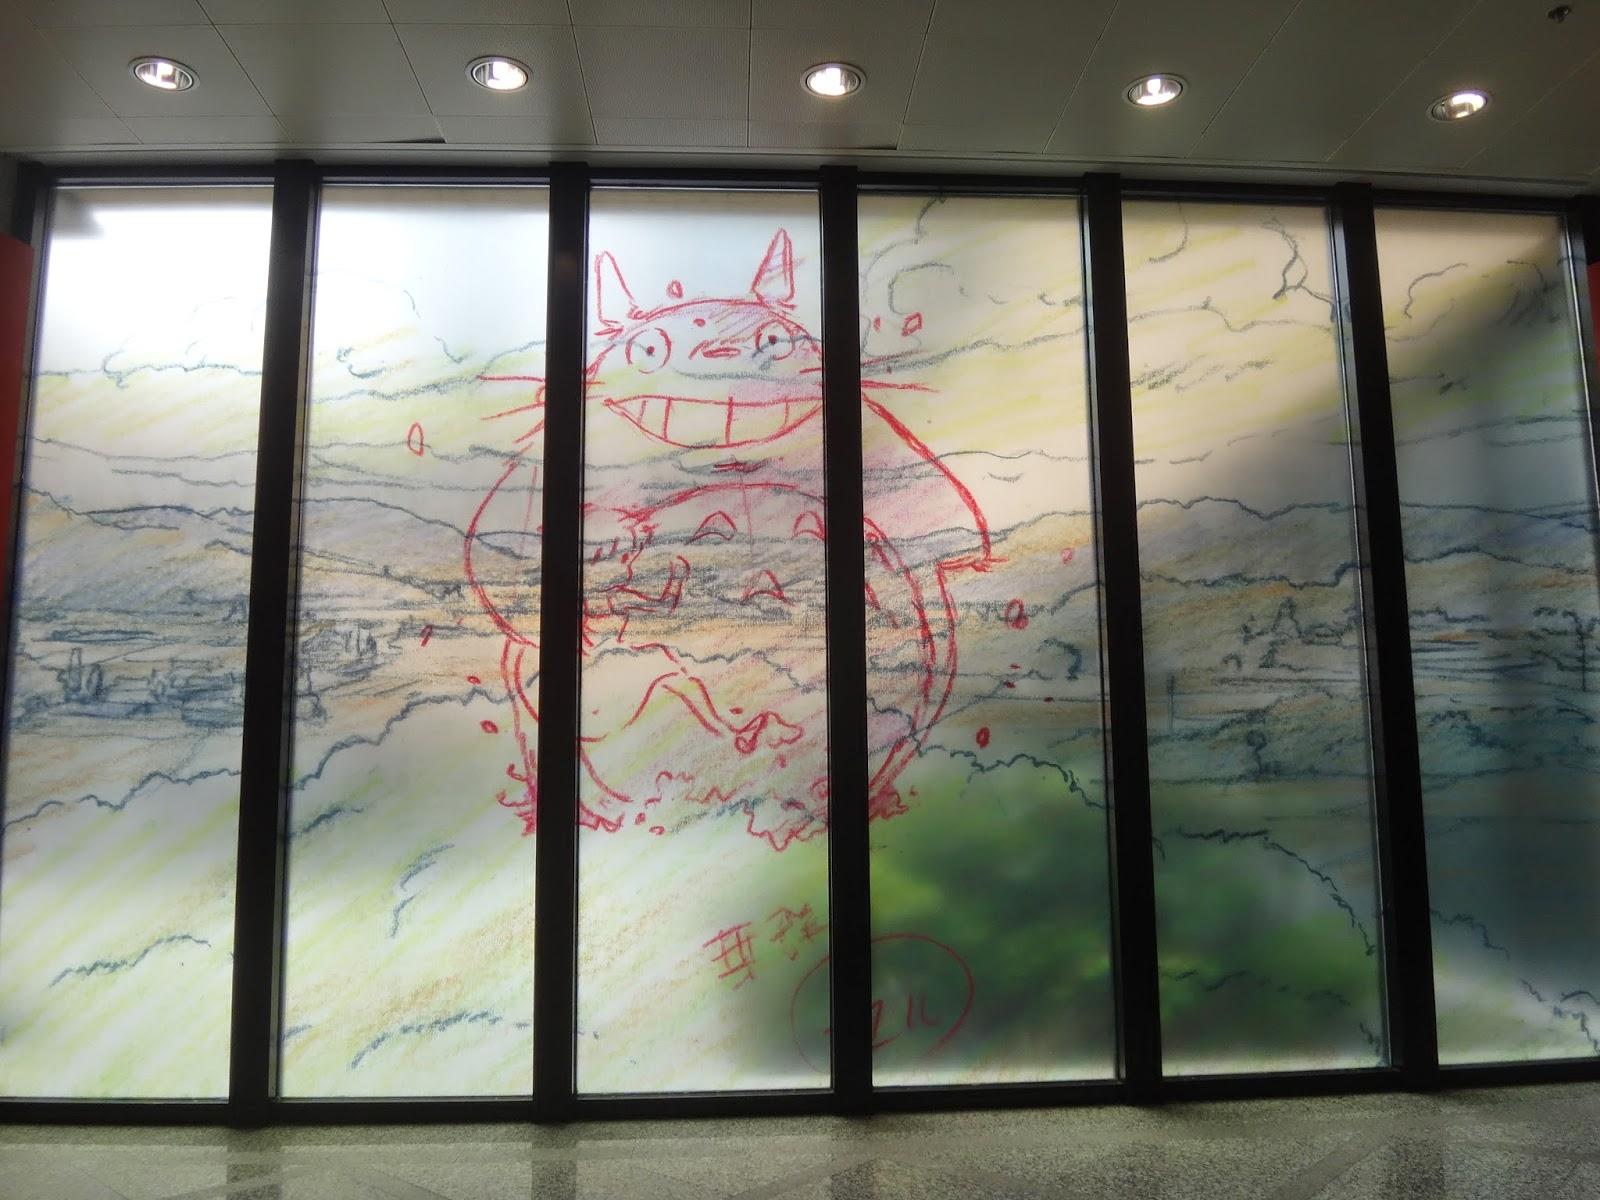 Soldier 的世界: 日本吉卜力工作室場面設計手稿展。看宮崎駿及高畑勳電影漫畫作品